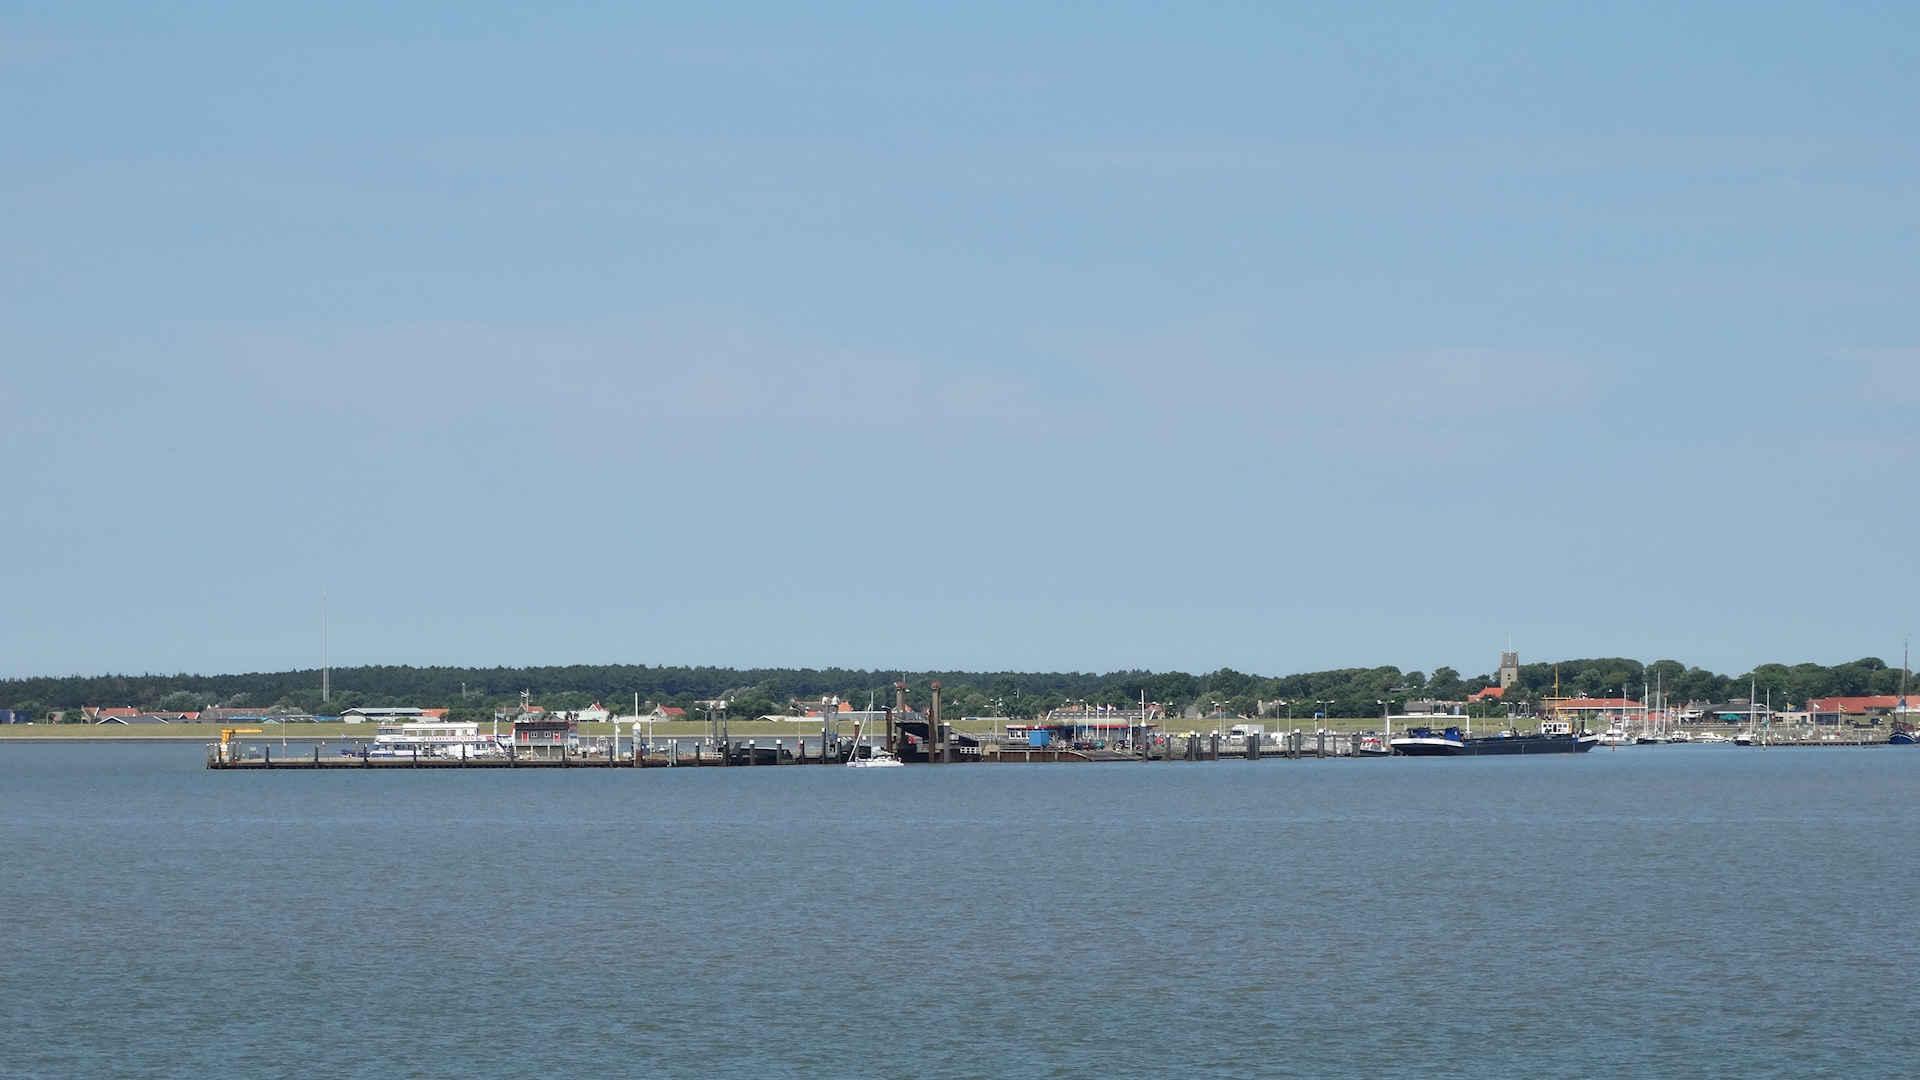 Vakantiebungalows Ameland - De haven op Ameland